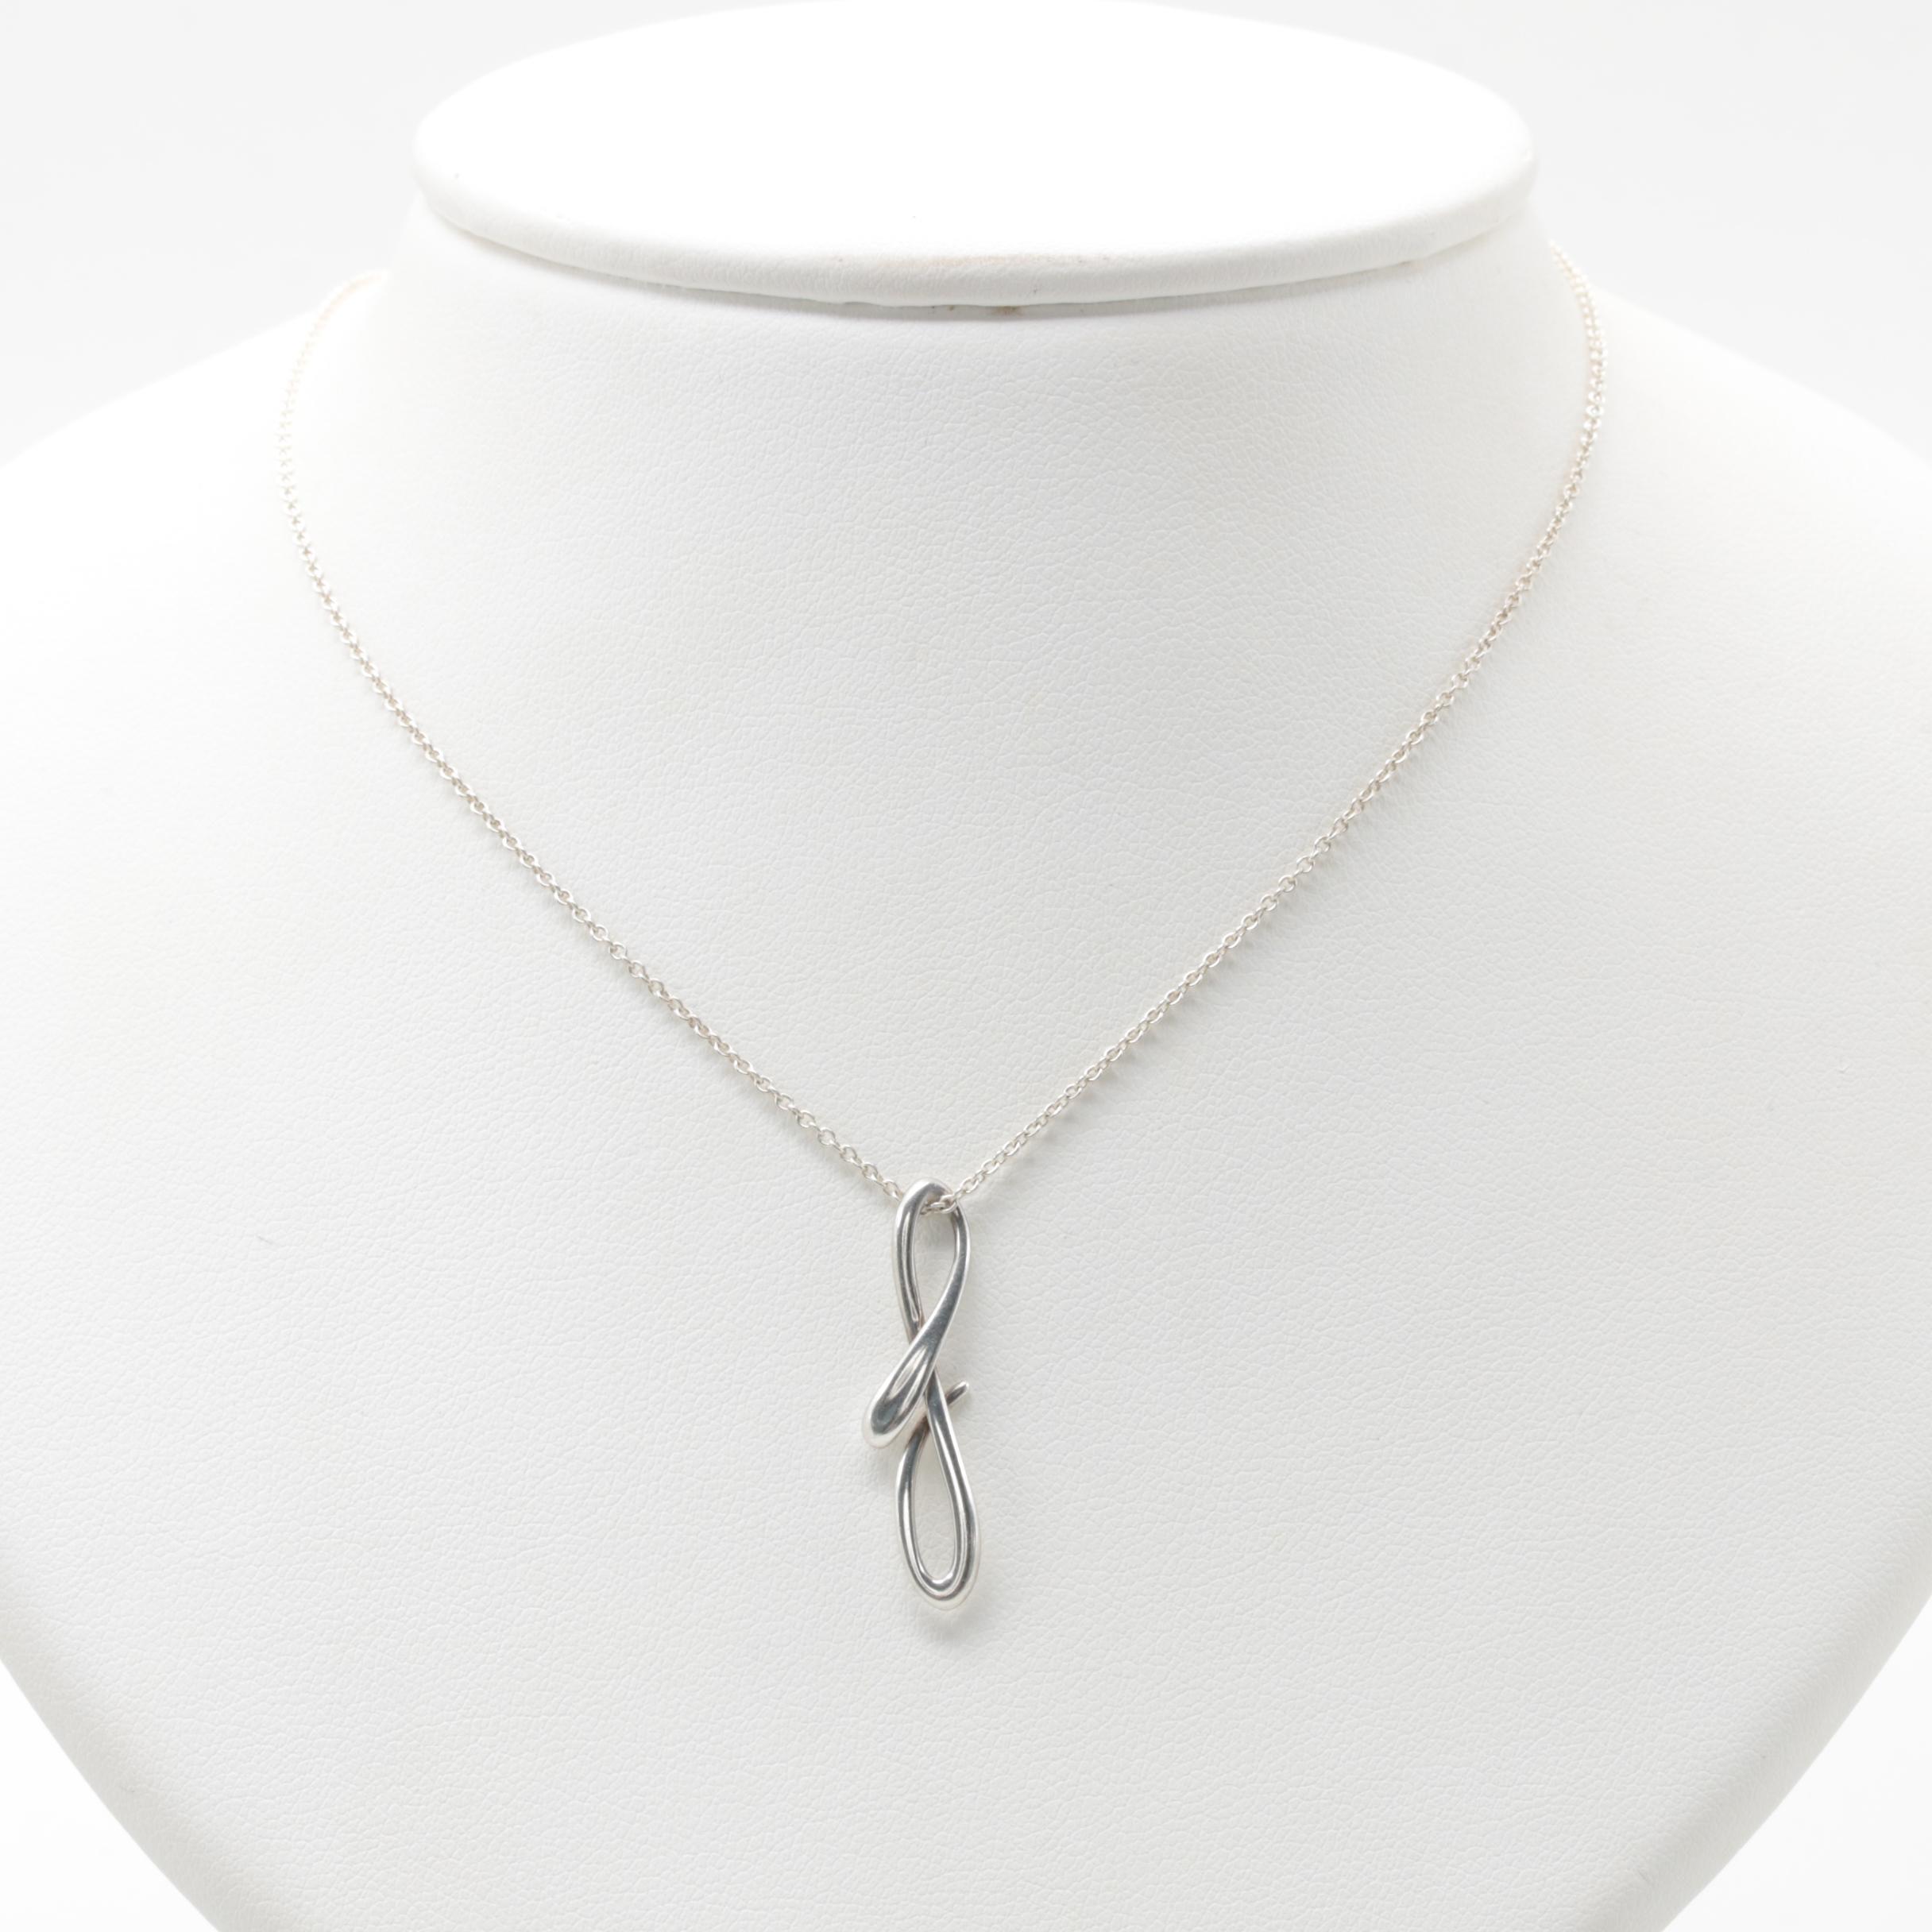 "Elsa Peretti for Tiffany & Co. Sterling Silver ""Letter F"" Pendant Necklace"